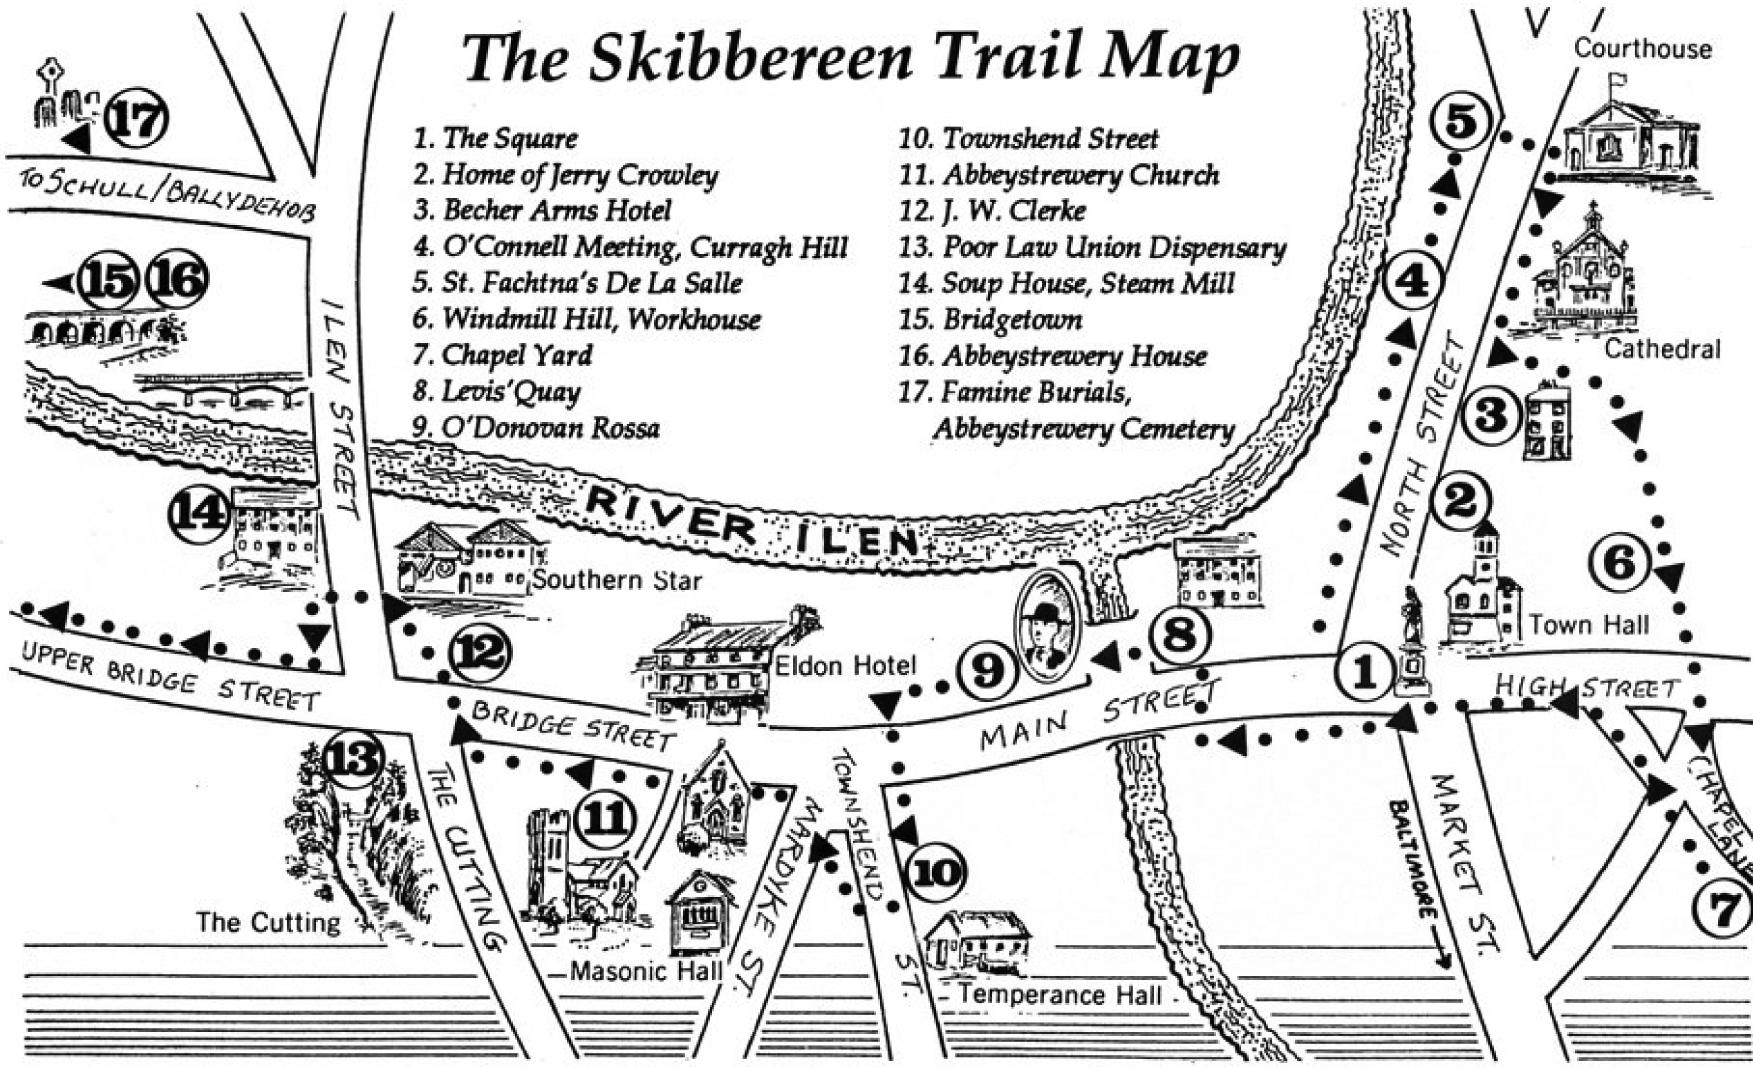 SkibbTrail map